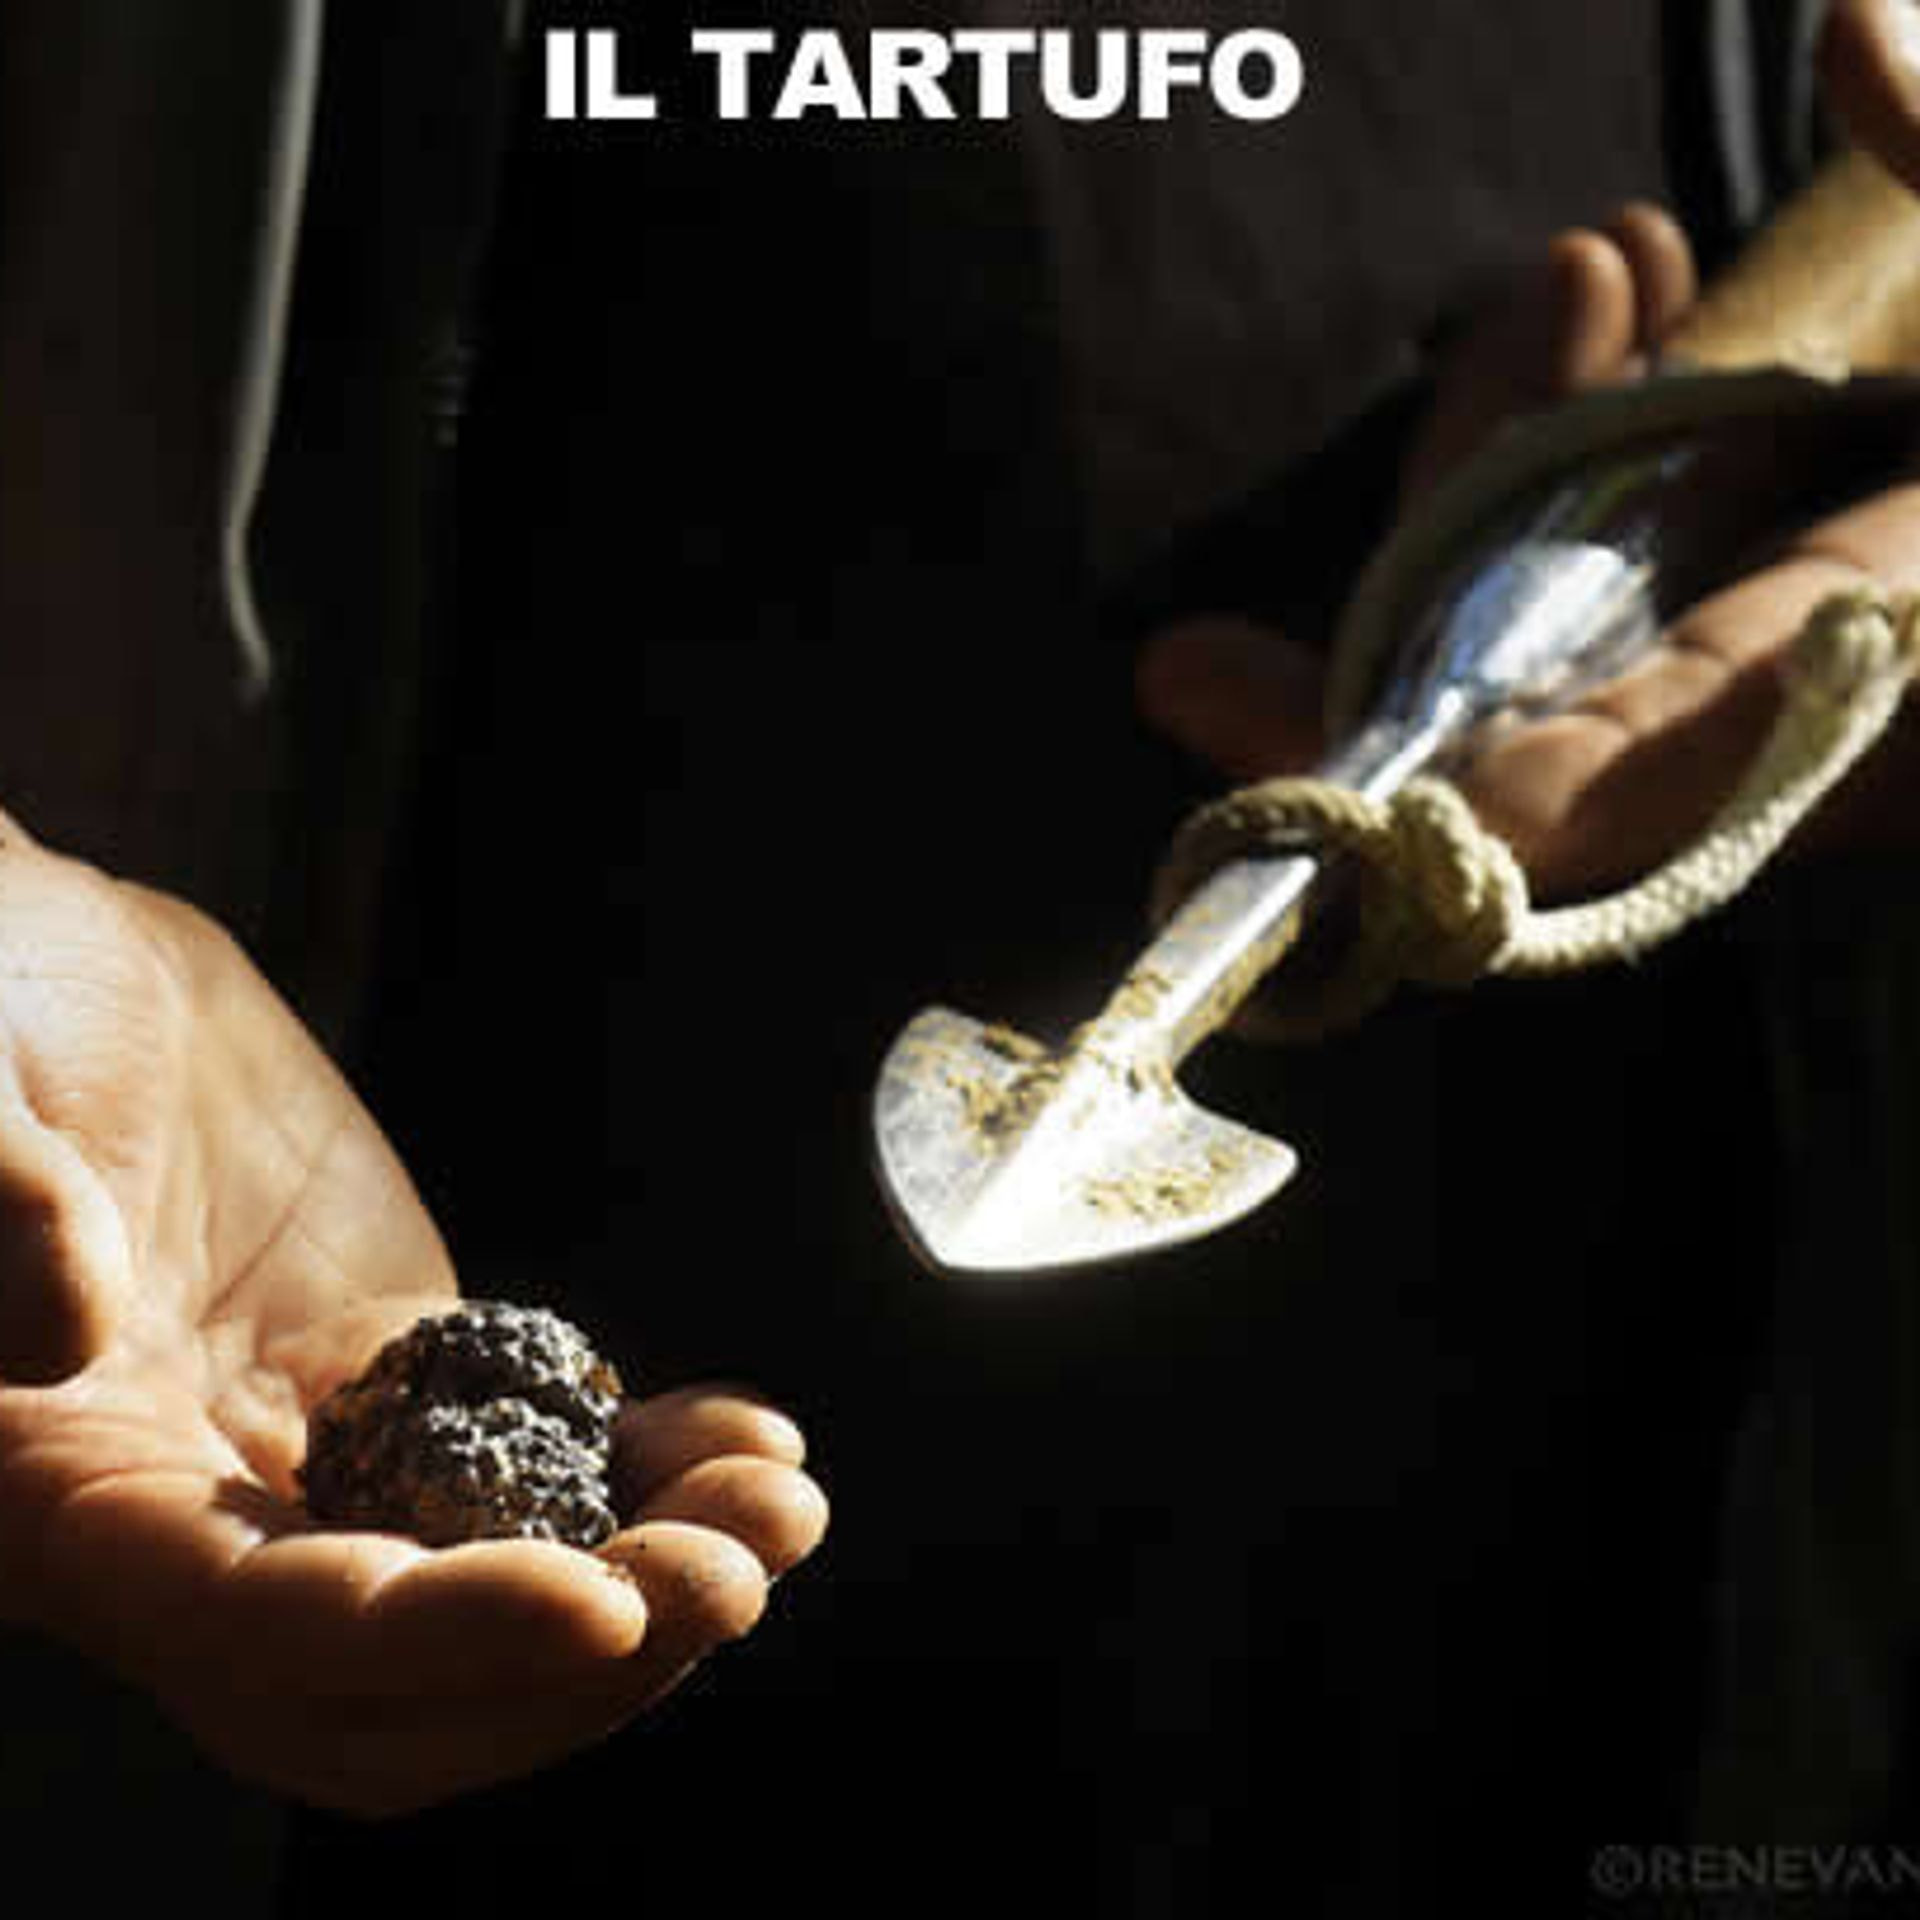 tartufo, tartufi, tartufo nero estivo, tartufo bianchetto